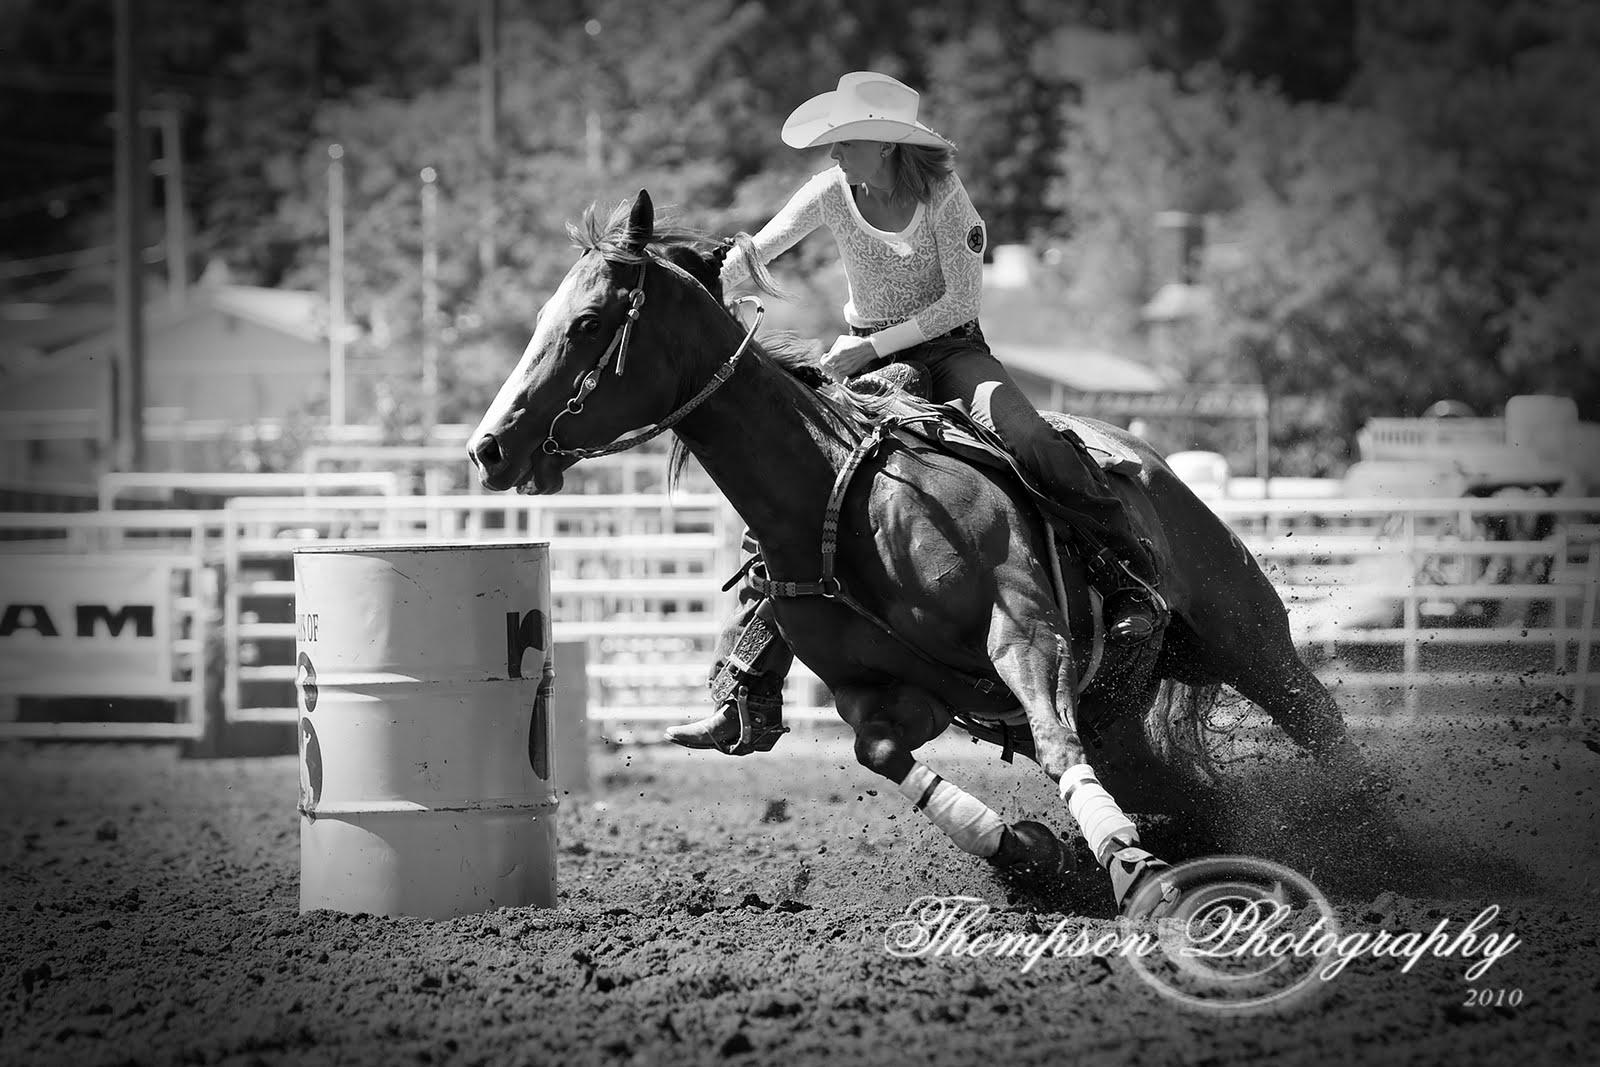 Thompson Photography Photo Blog Days Of 76 Wpra Barrel Racing Slack